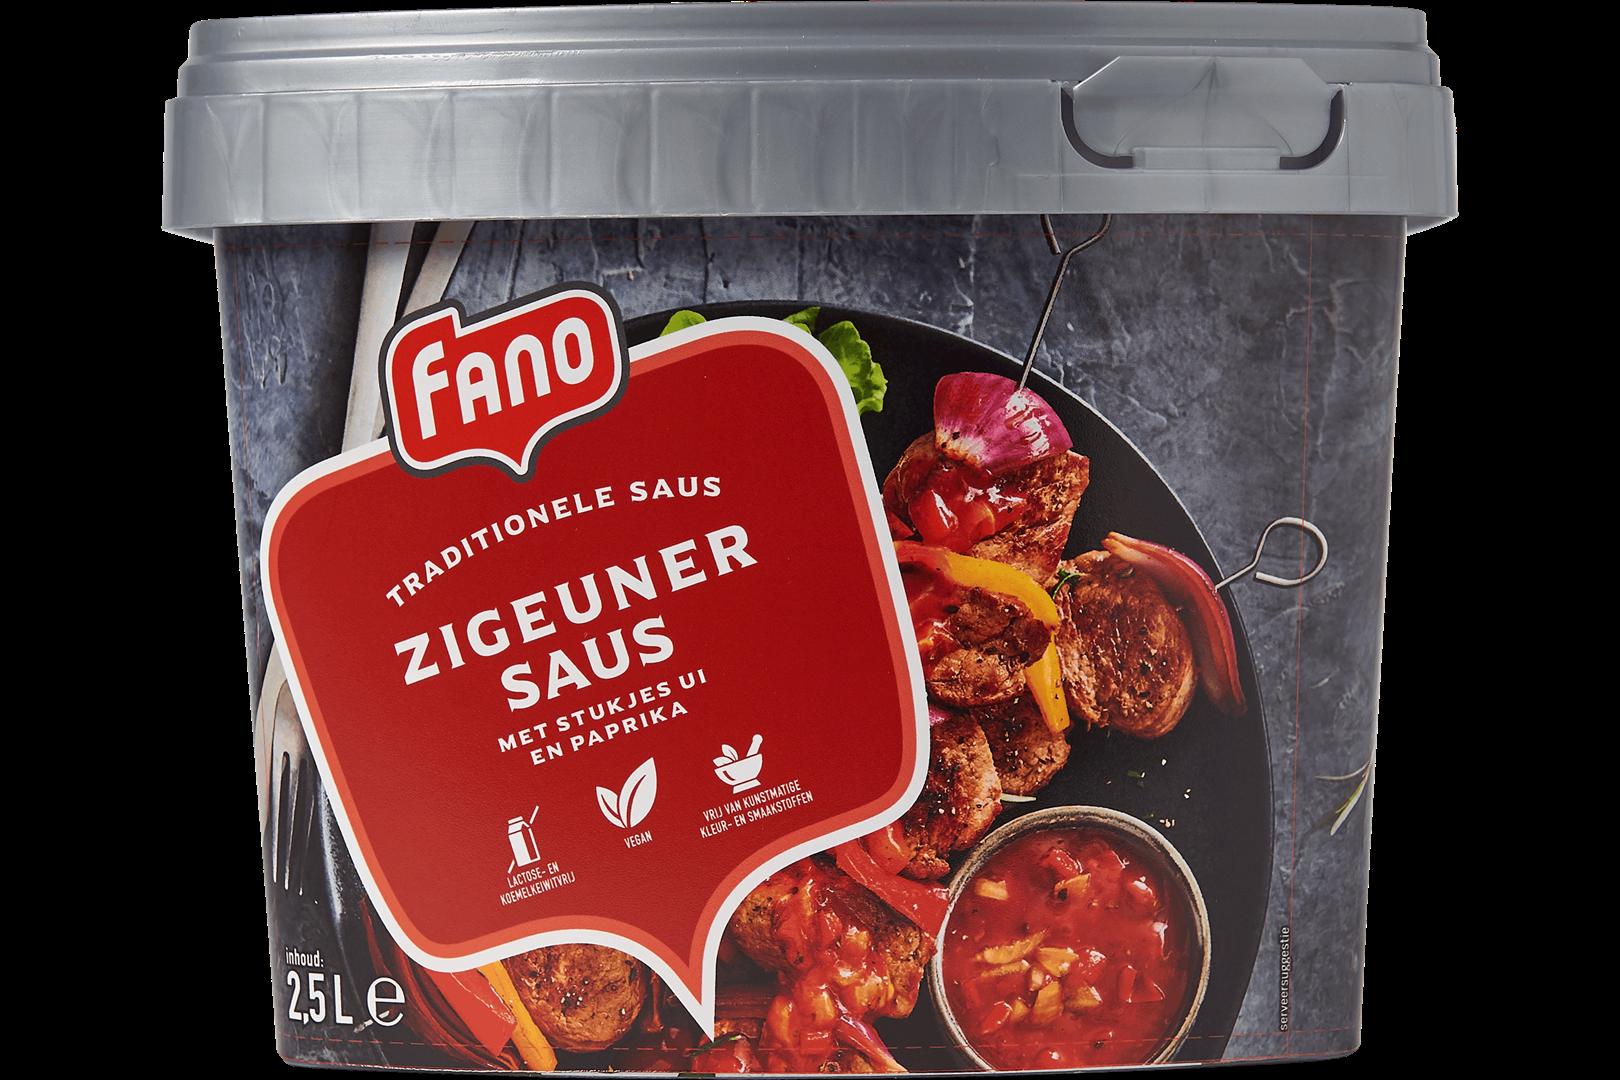 Productafbeelding FANO Zigeunersaus 2.5l